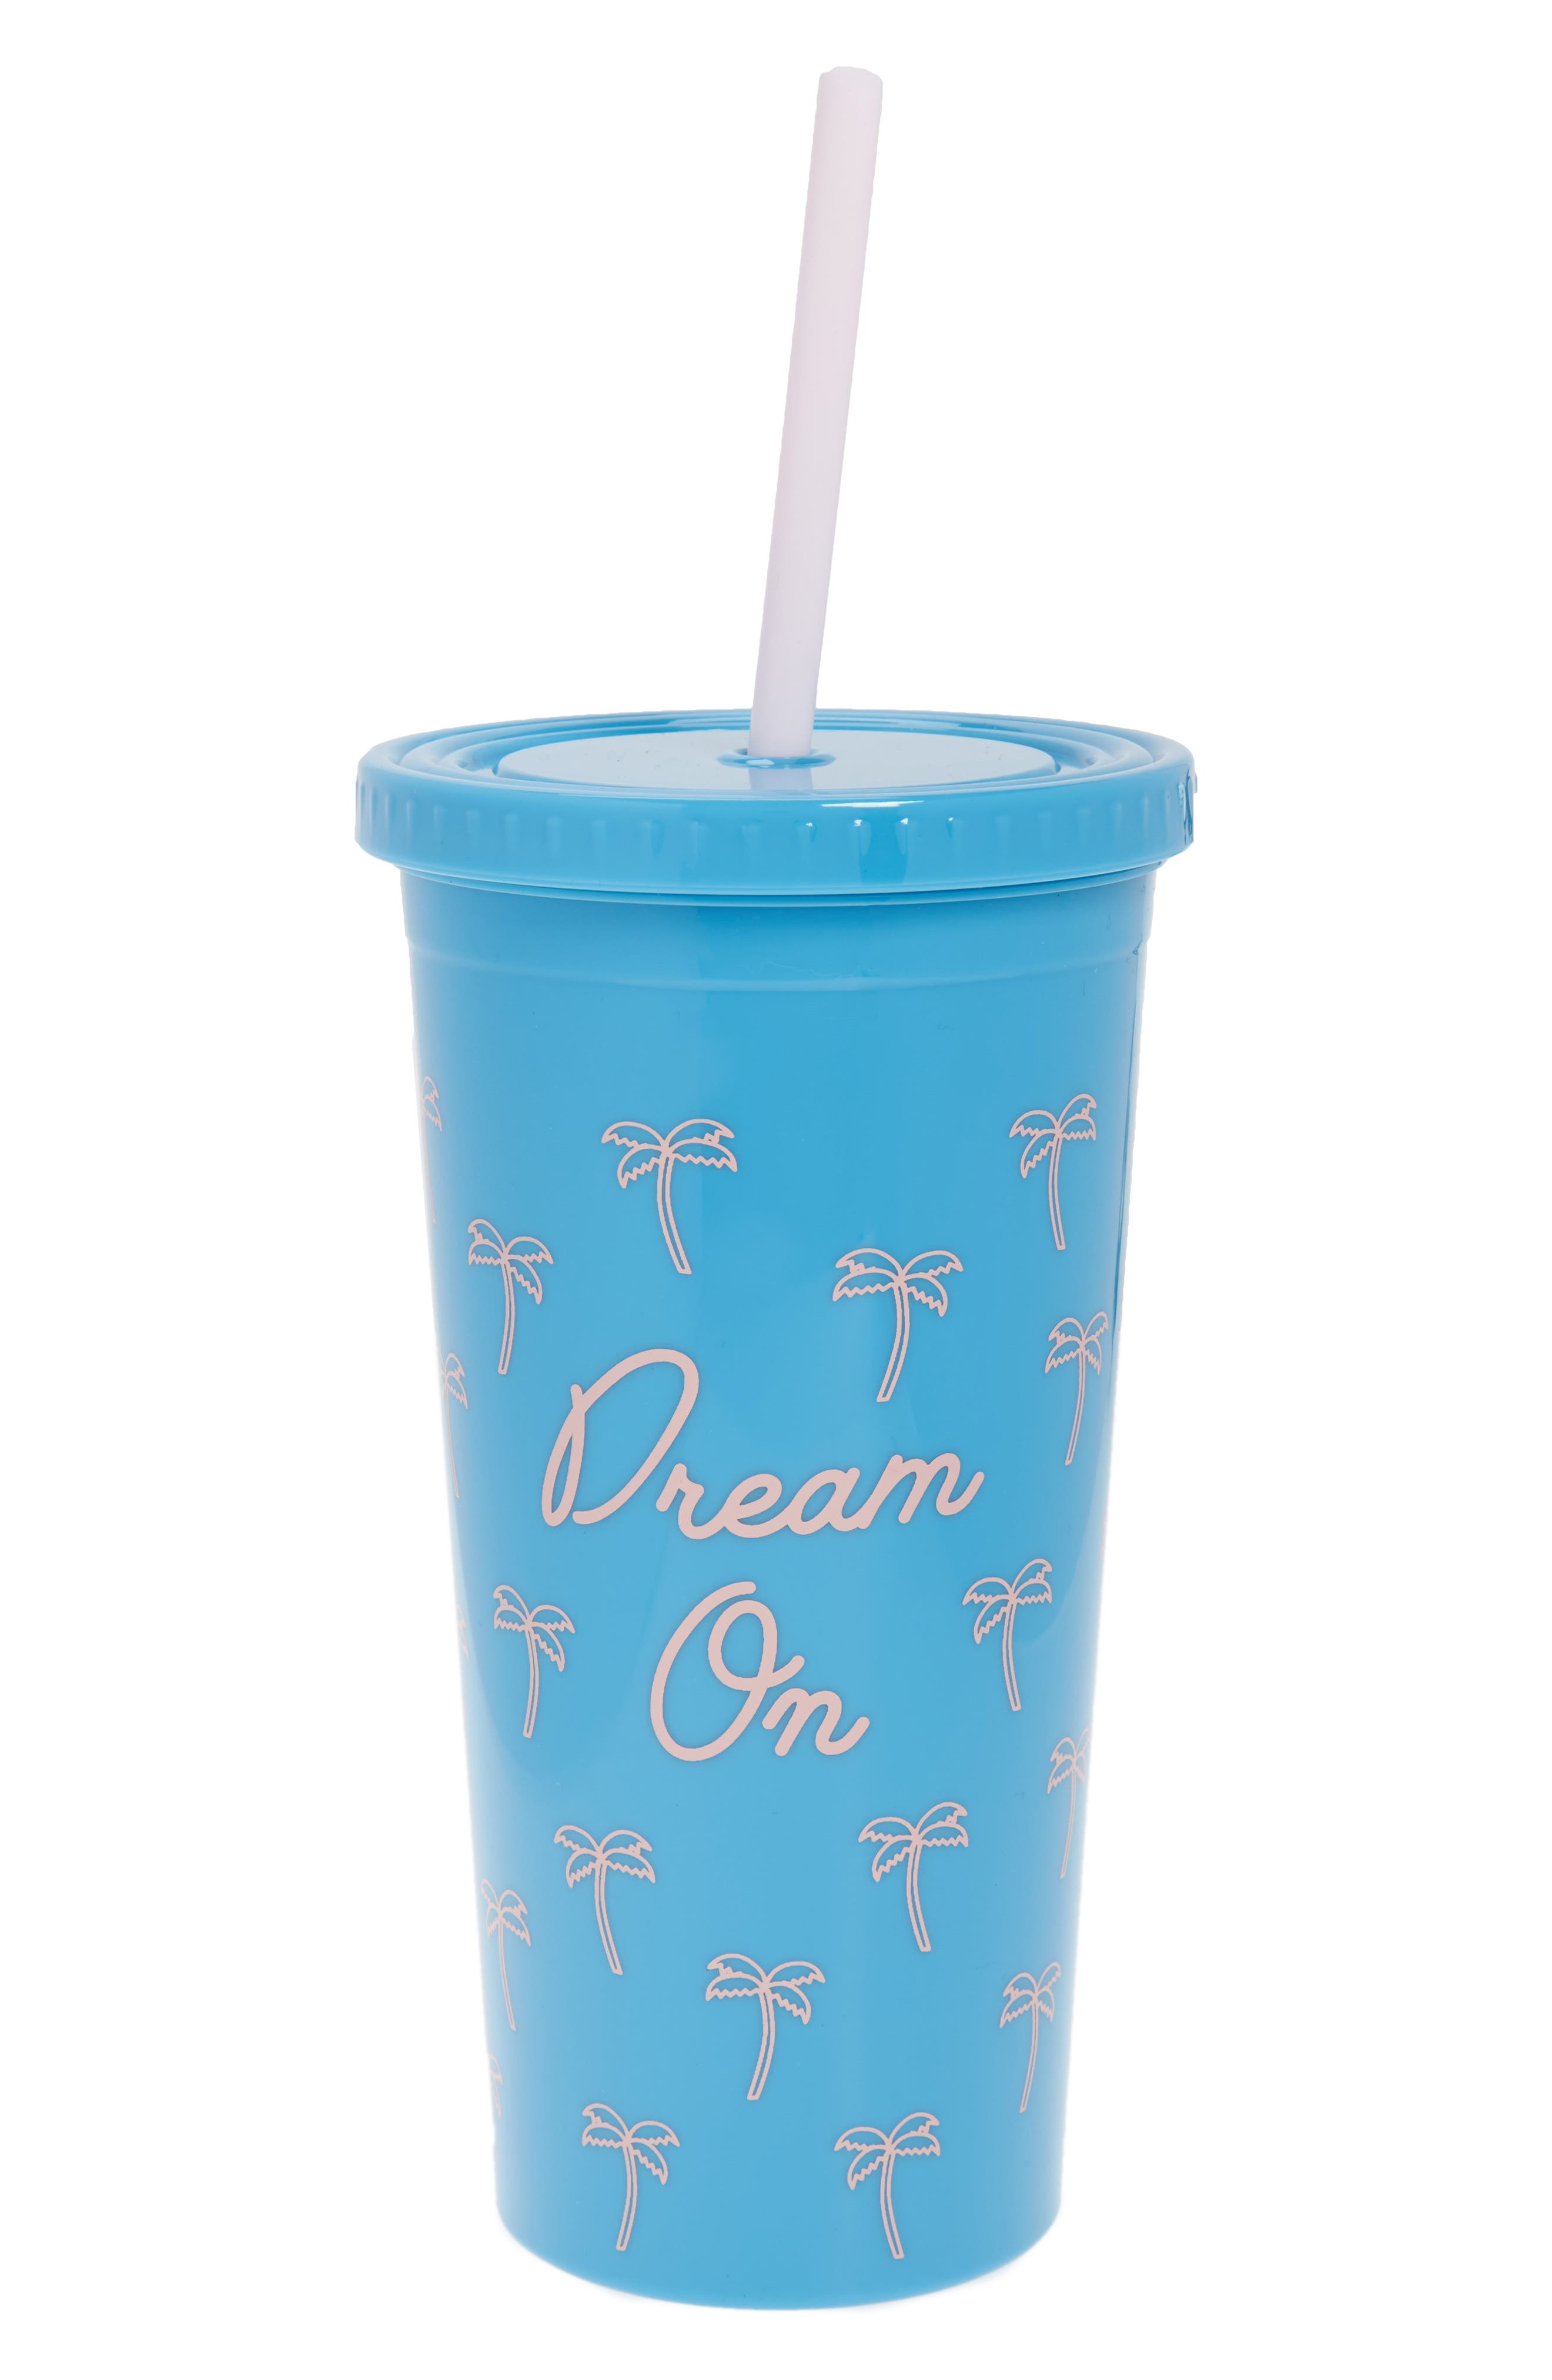 Dream On Tumbler & Straw,                         Main,                         color, Blue